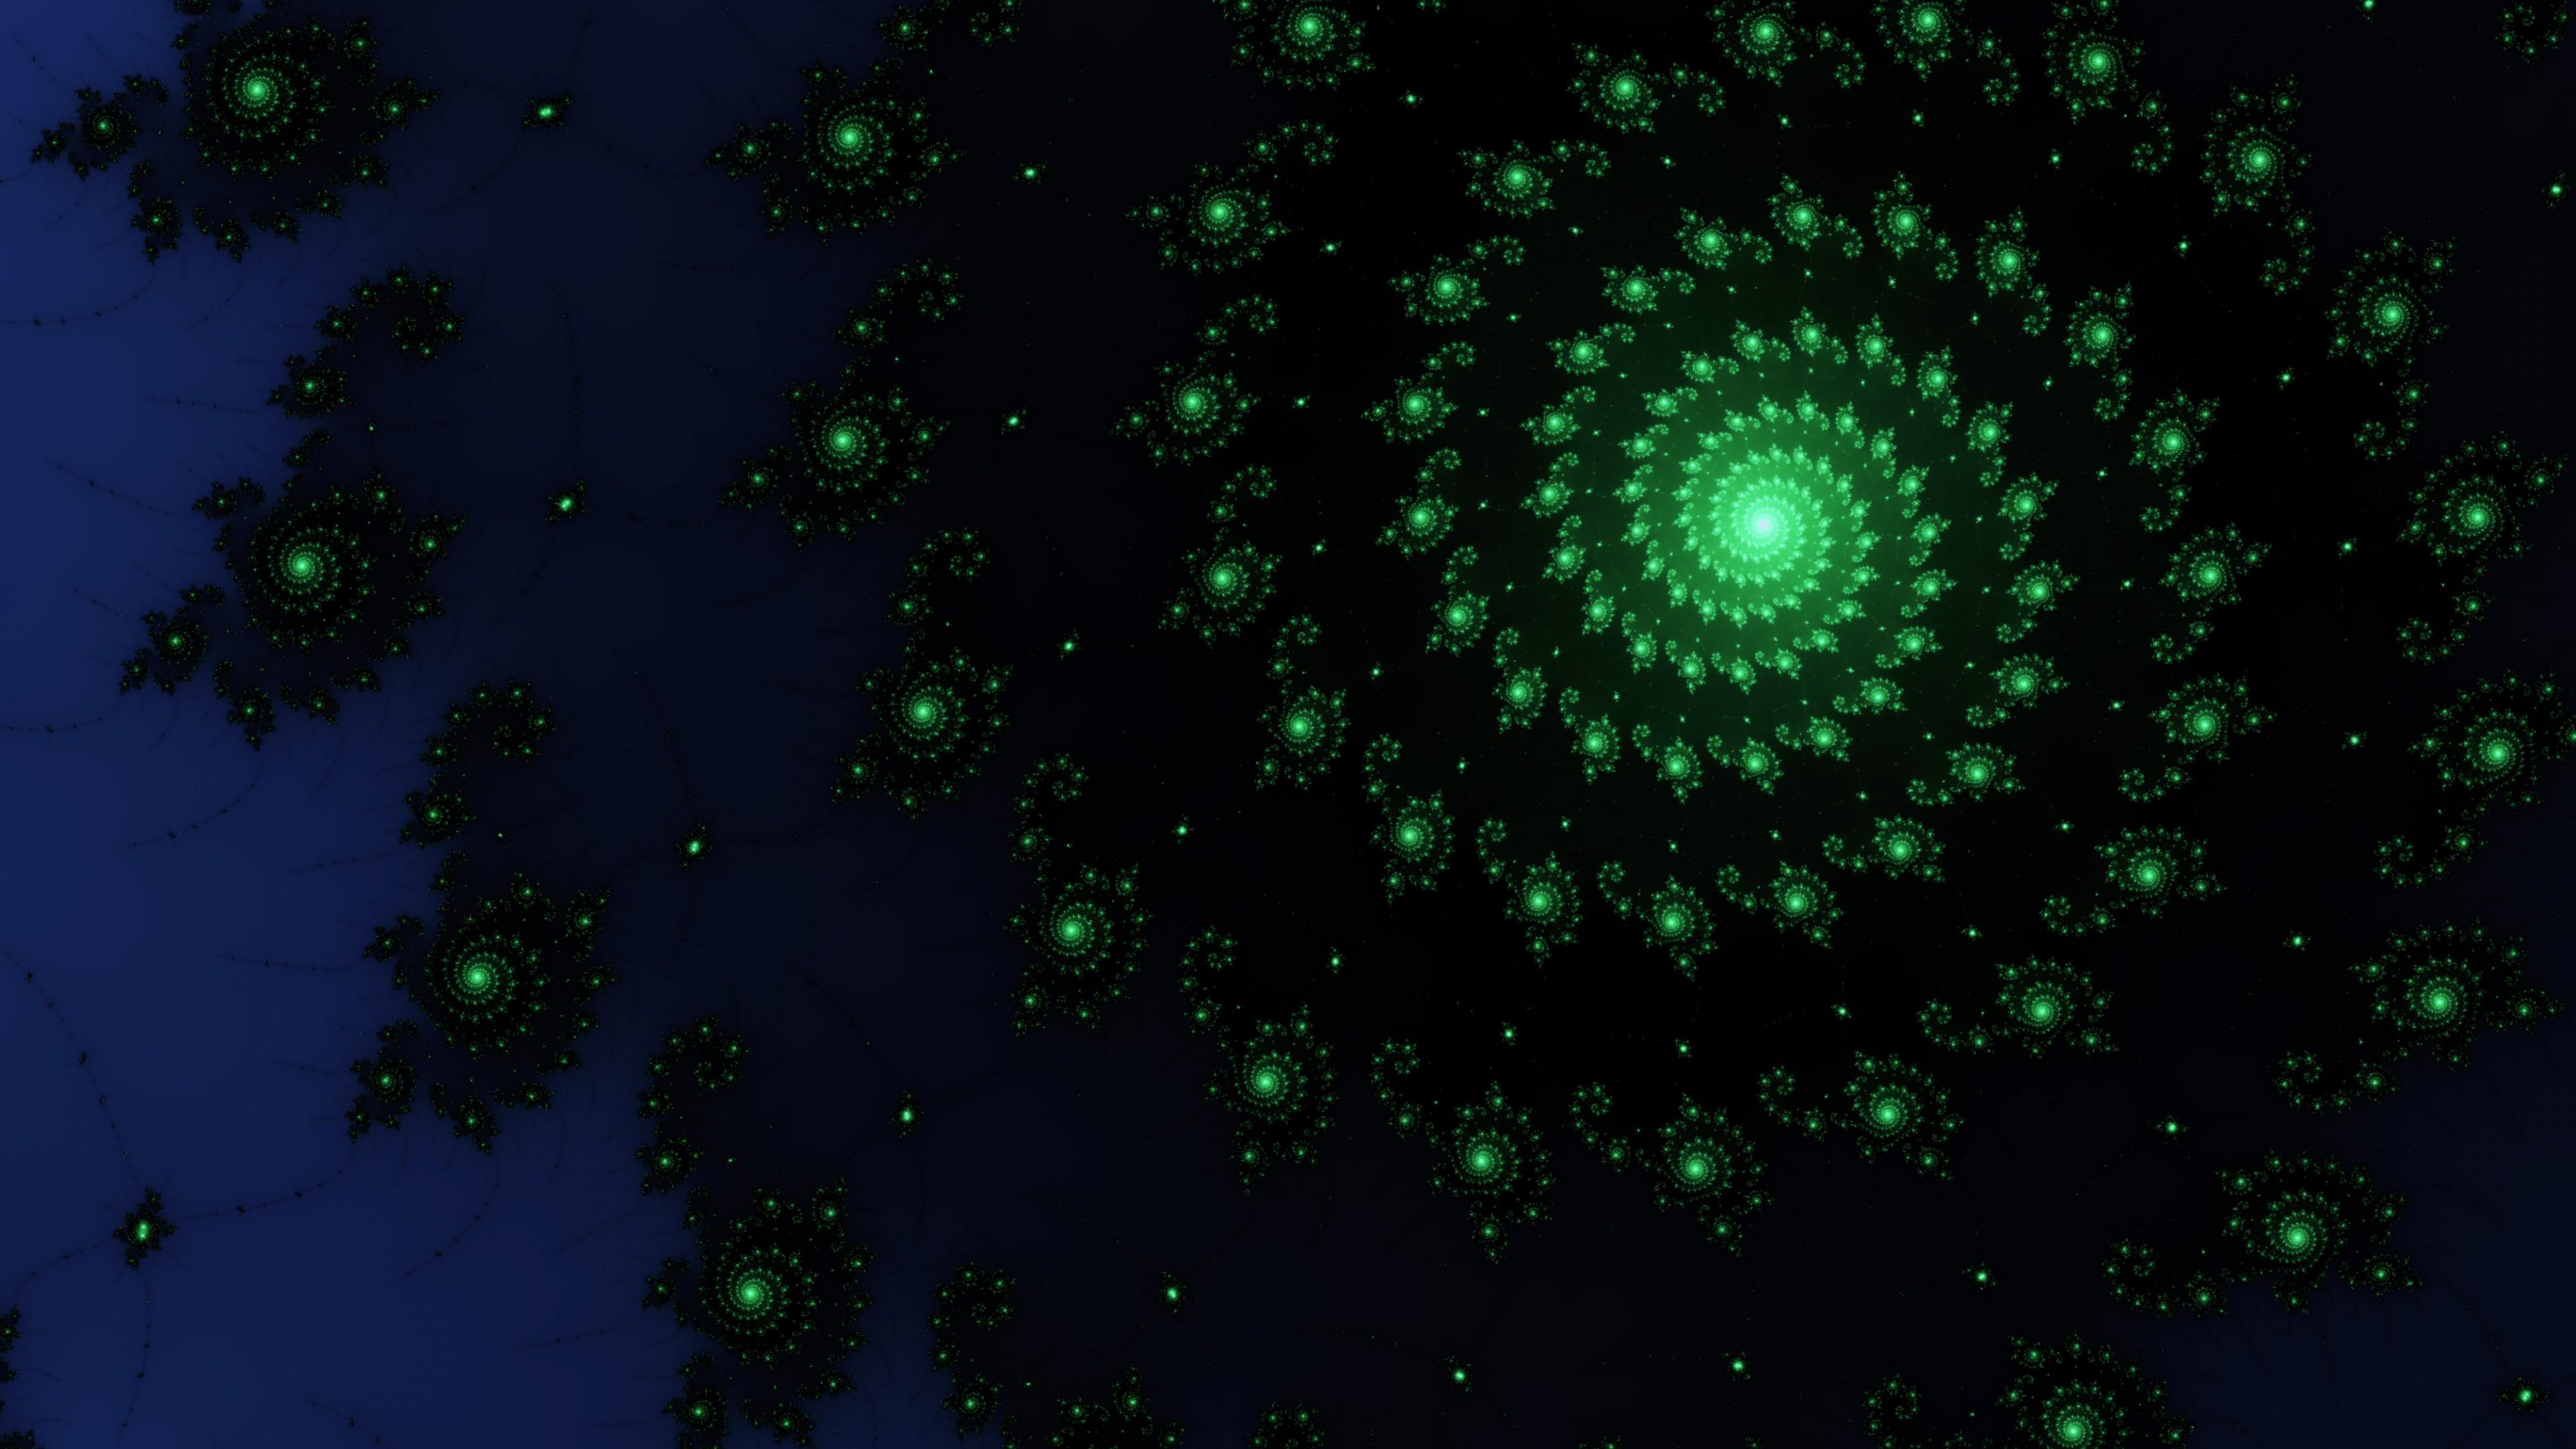 3d Green Spiral Galaxy Wallpaper For Desktop And Mobile 4k